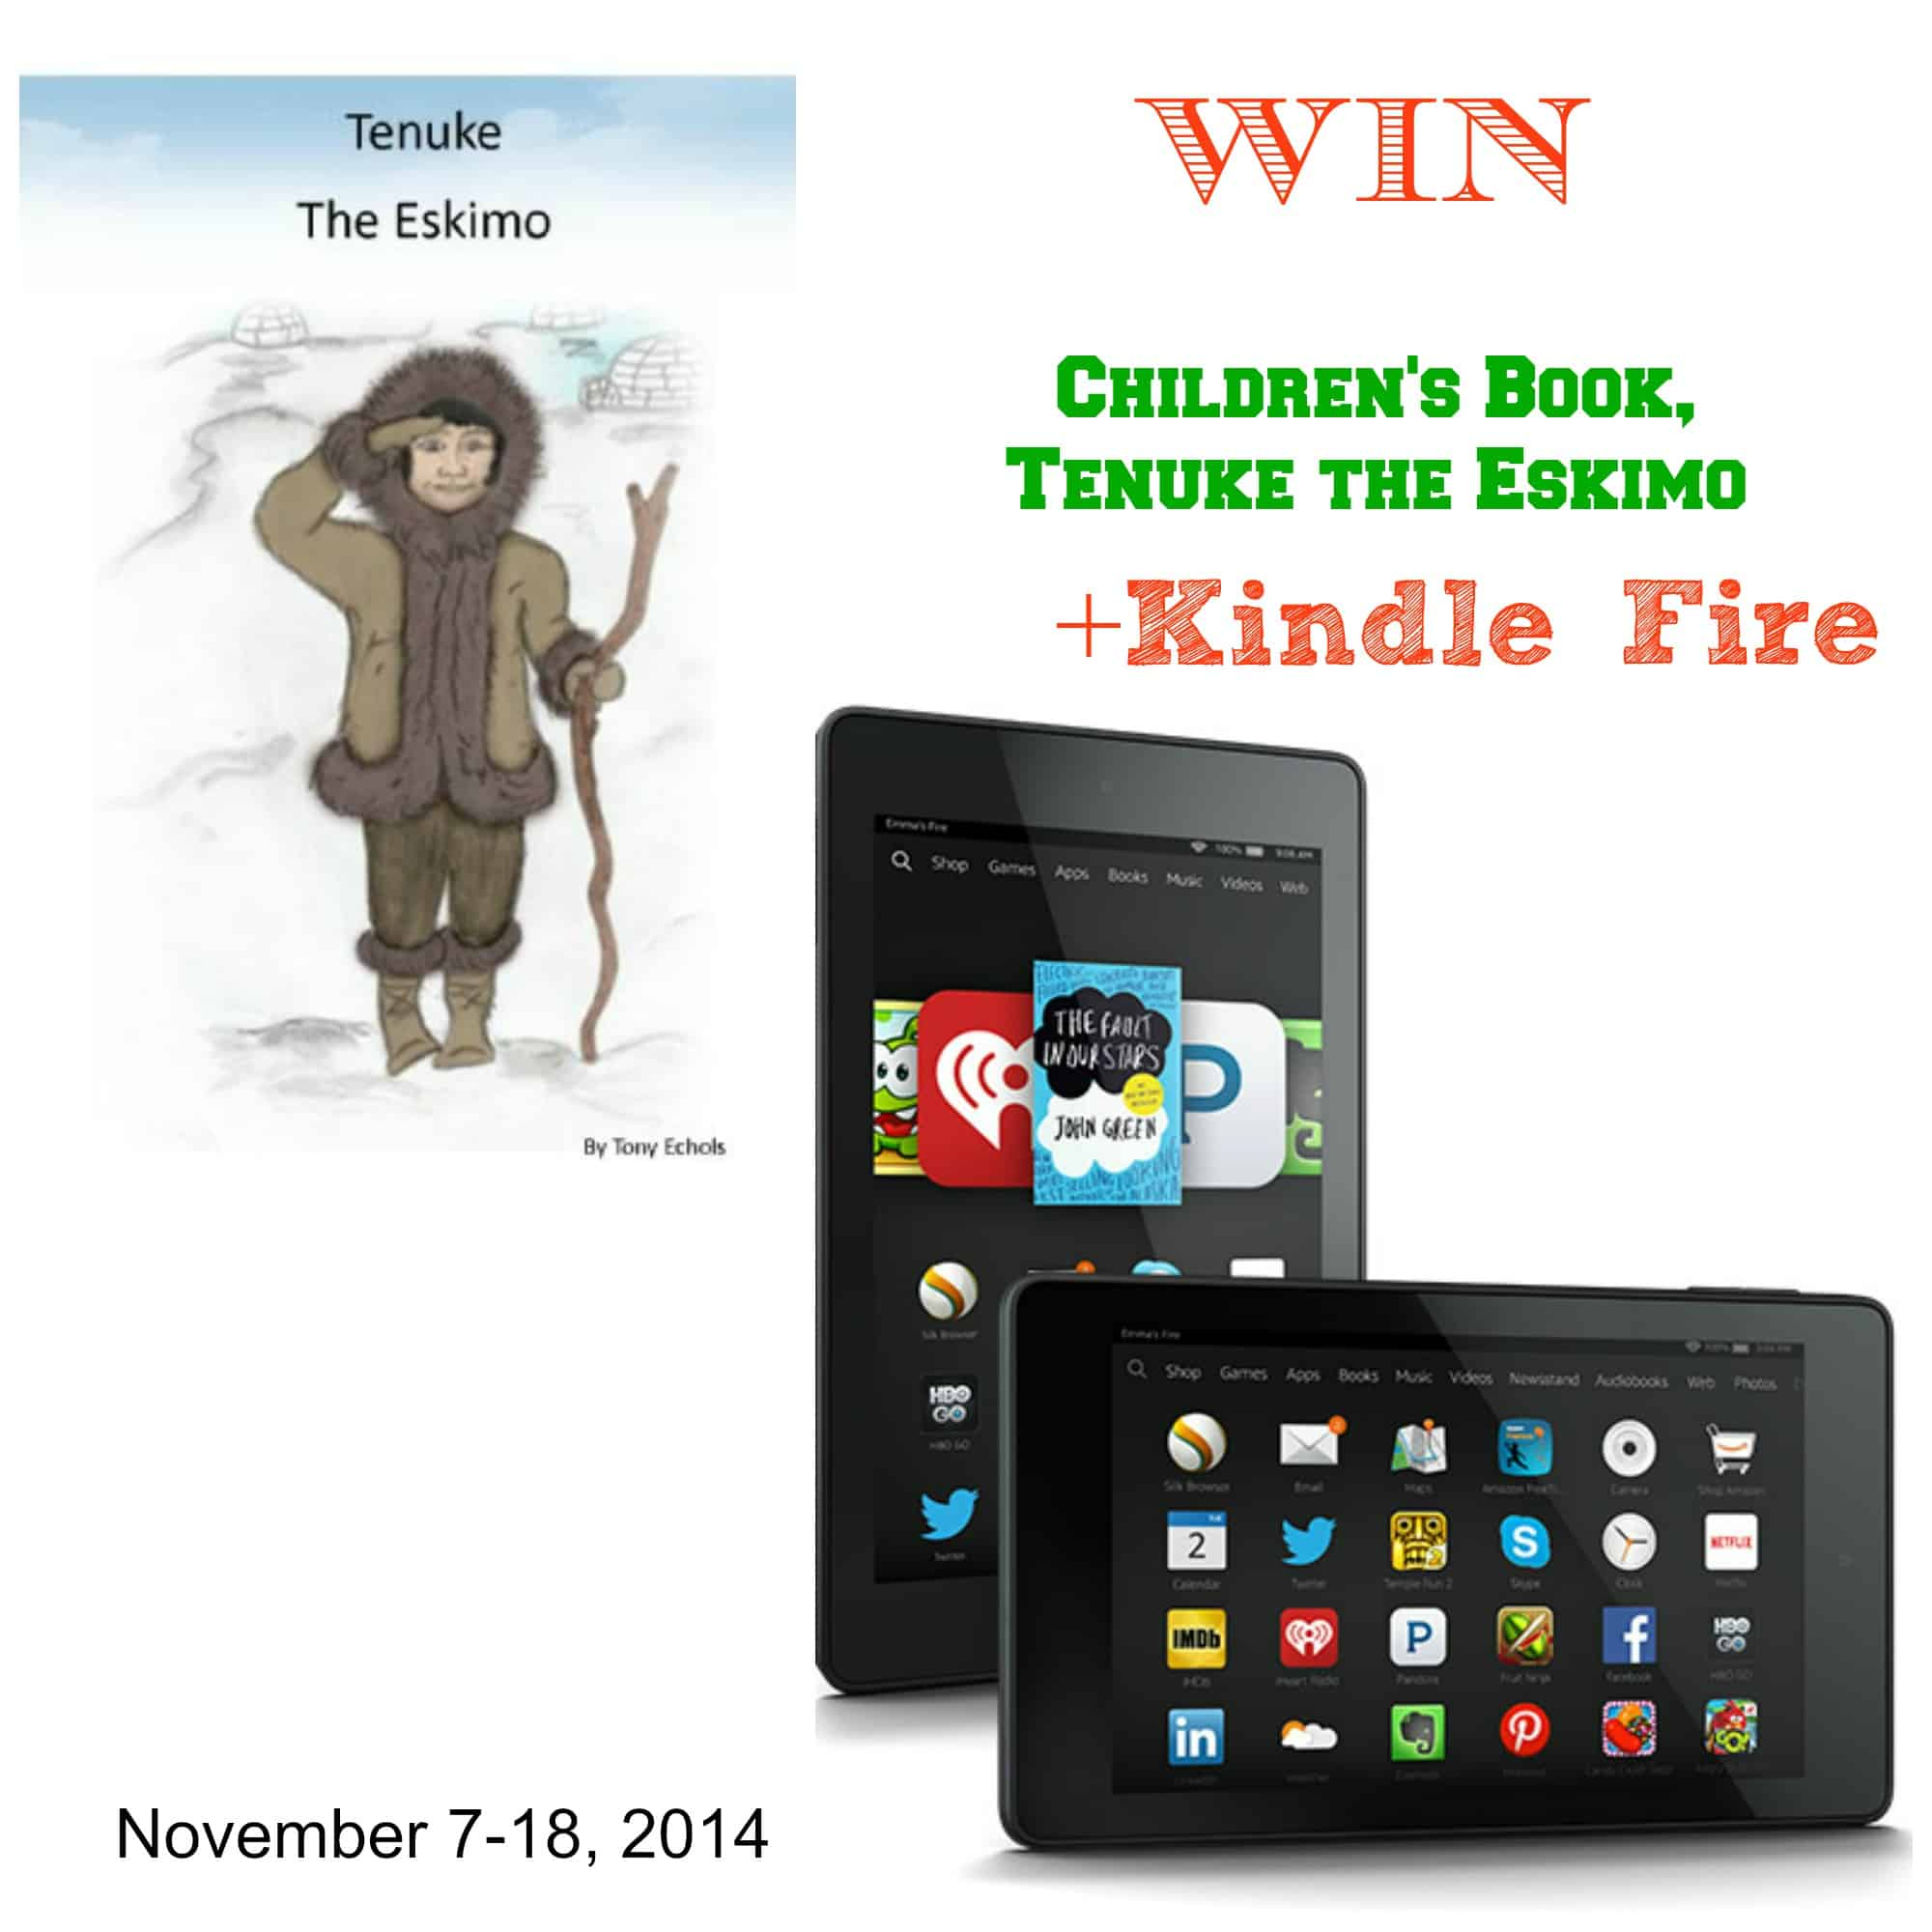 Tenuke the Eskimo and Kindle Fire Giveaway